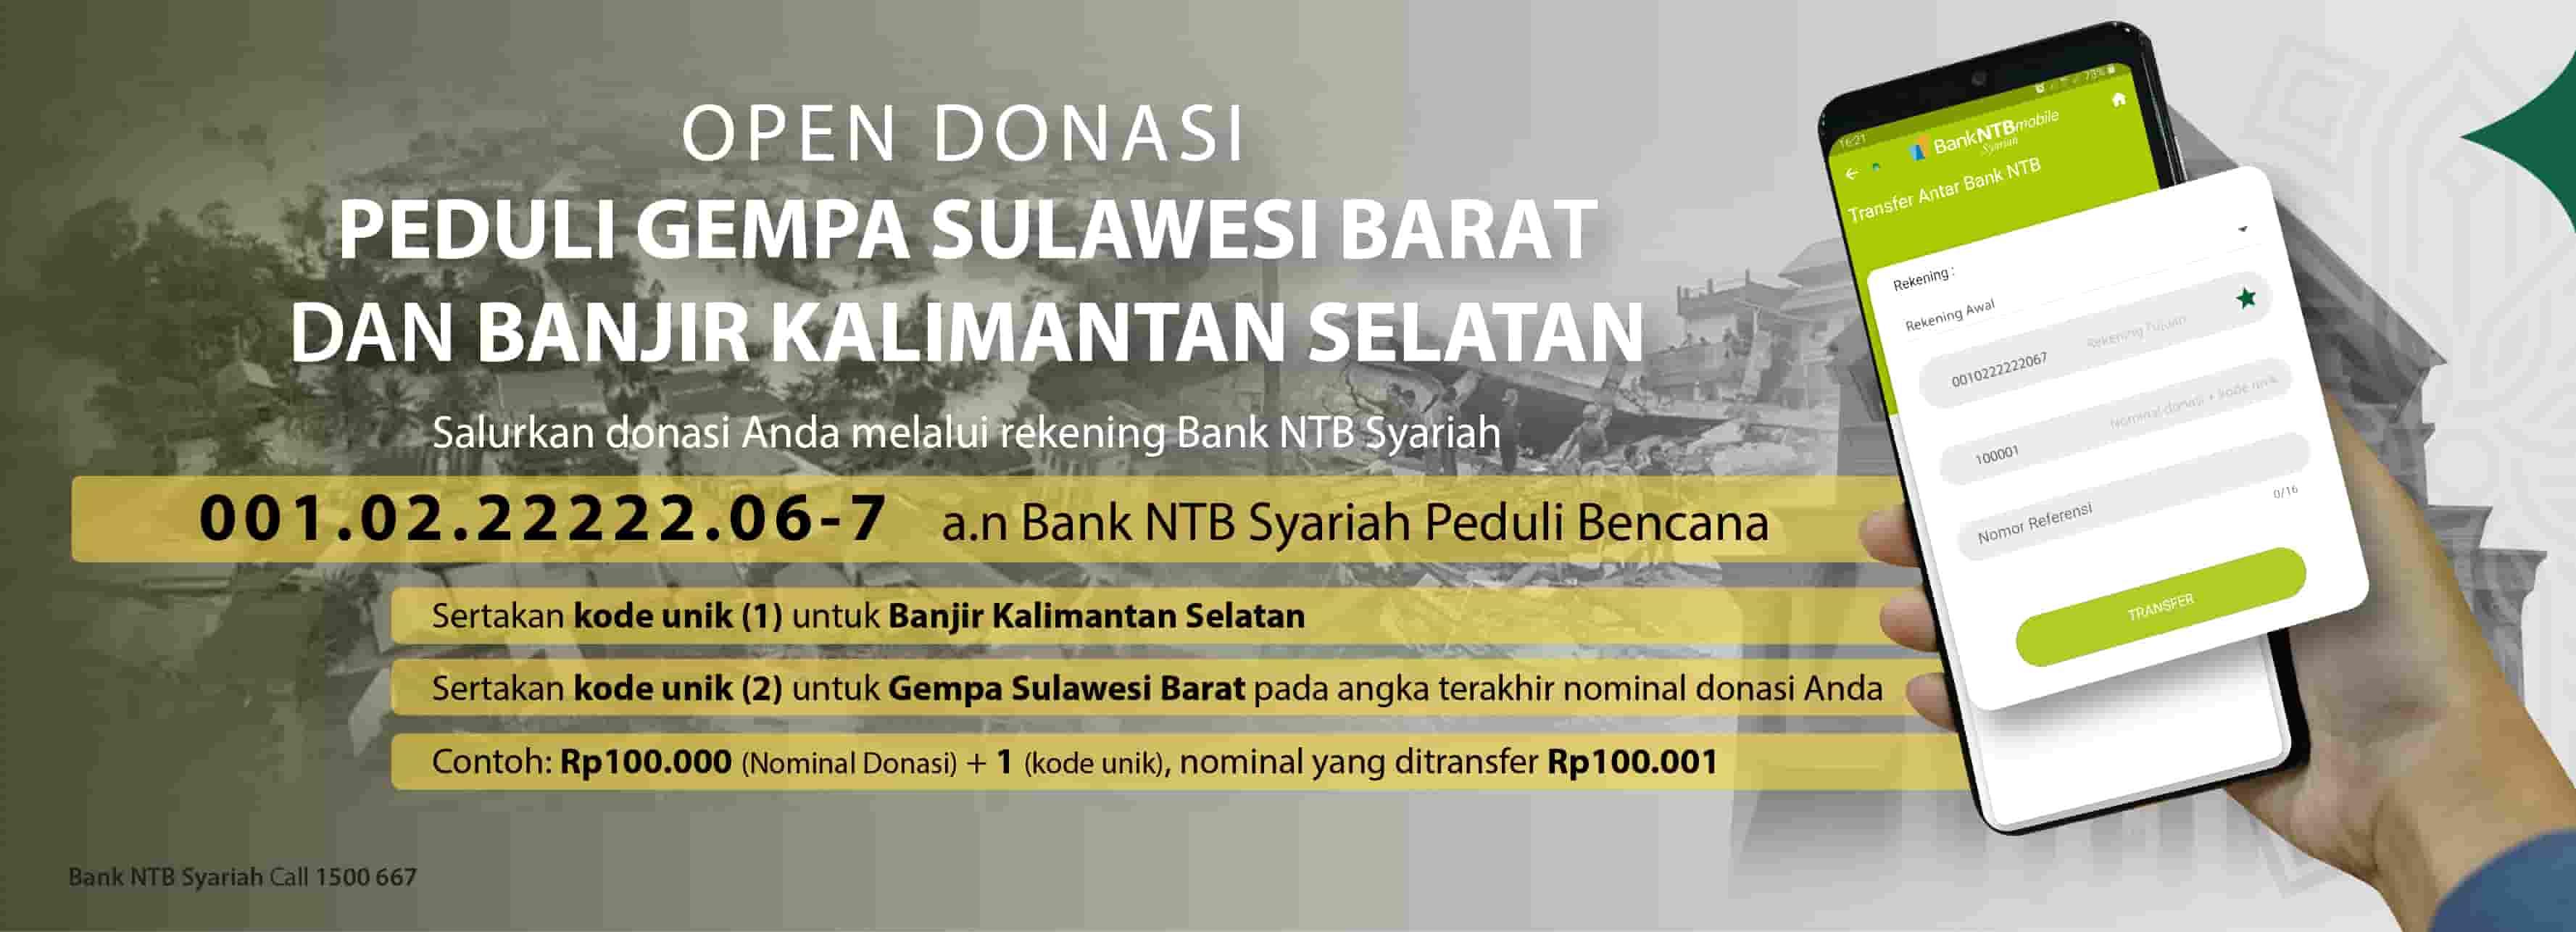 Peduli-Gempa-Sulawesi-Barat-Banjir-Kalimantan-Selatan.html